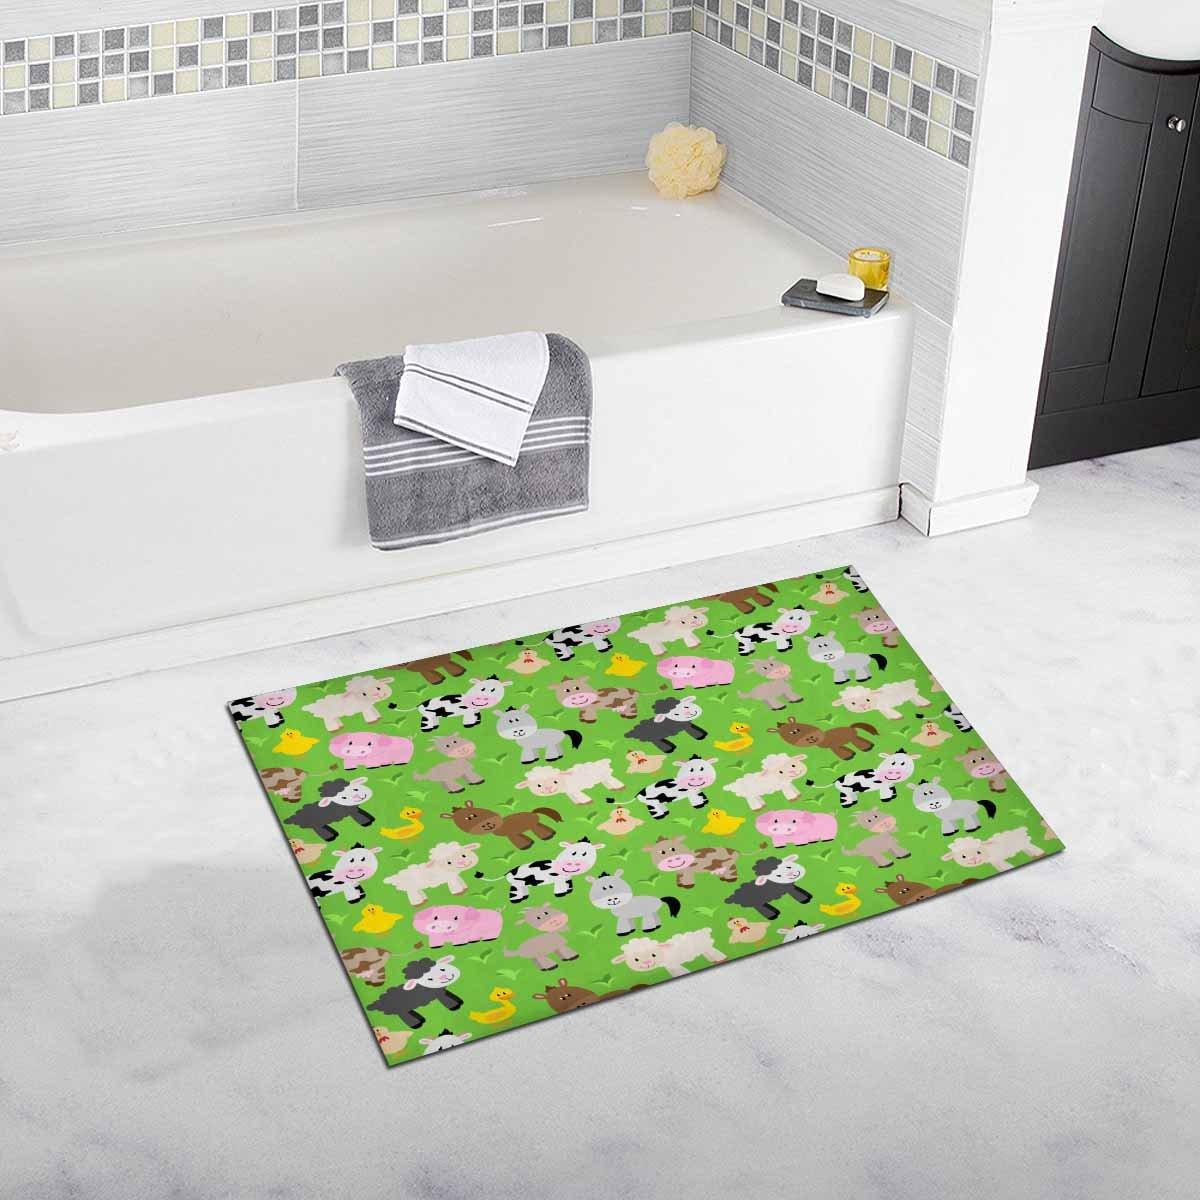 InterestPrint Tileable Farm Animal and Barnyard Bath Mat Soft Bathroom Rugs Non-slip Rubber0 20 W X 32 L Inches